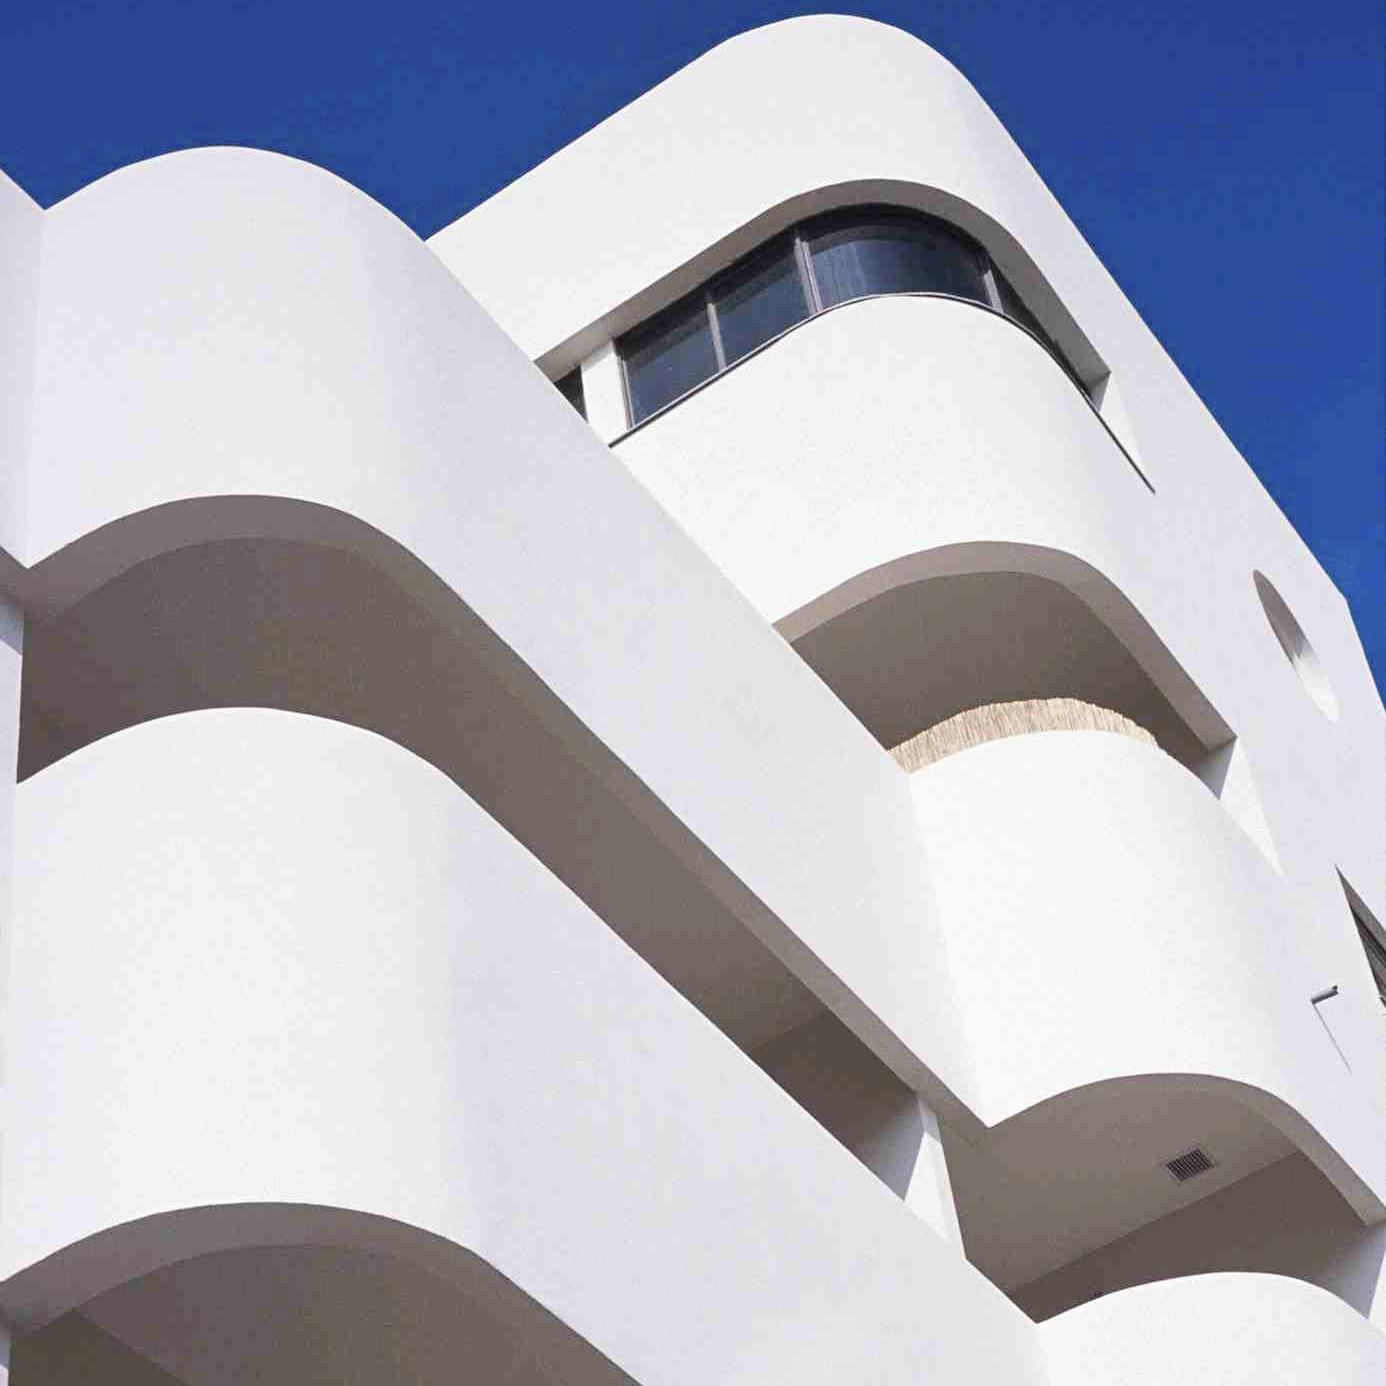 tel-aviv_bauhaus_white-city_israel-26-bruno-house.jpg